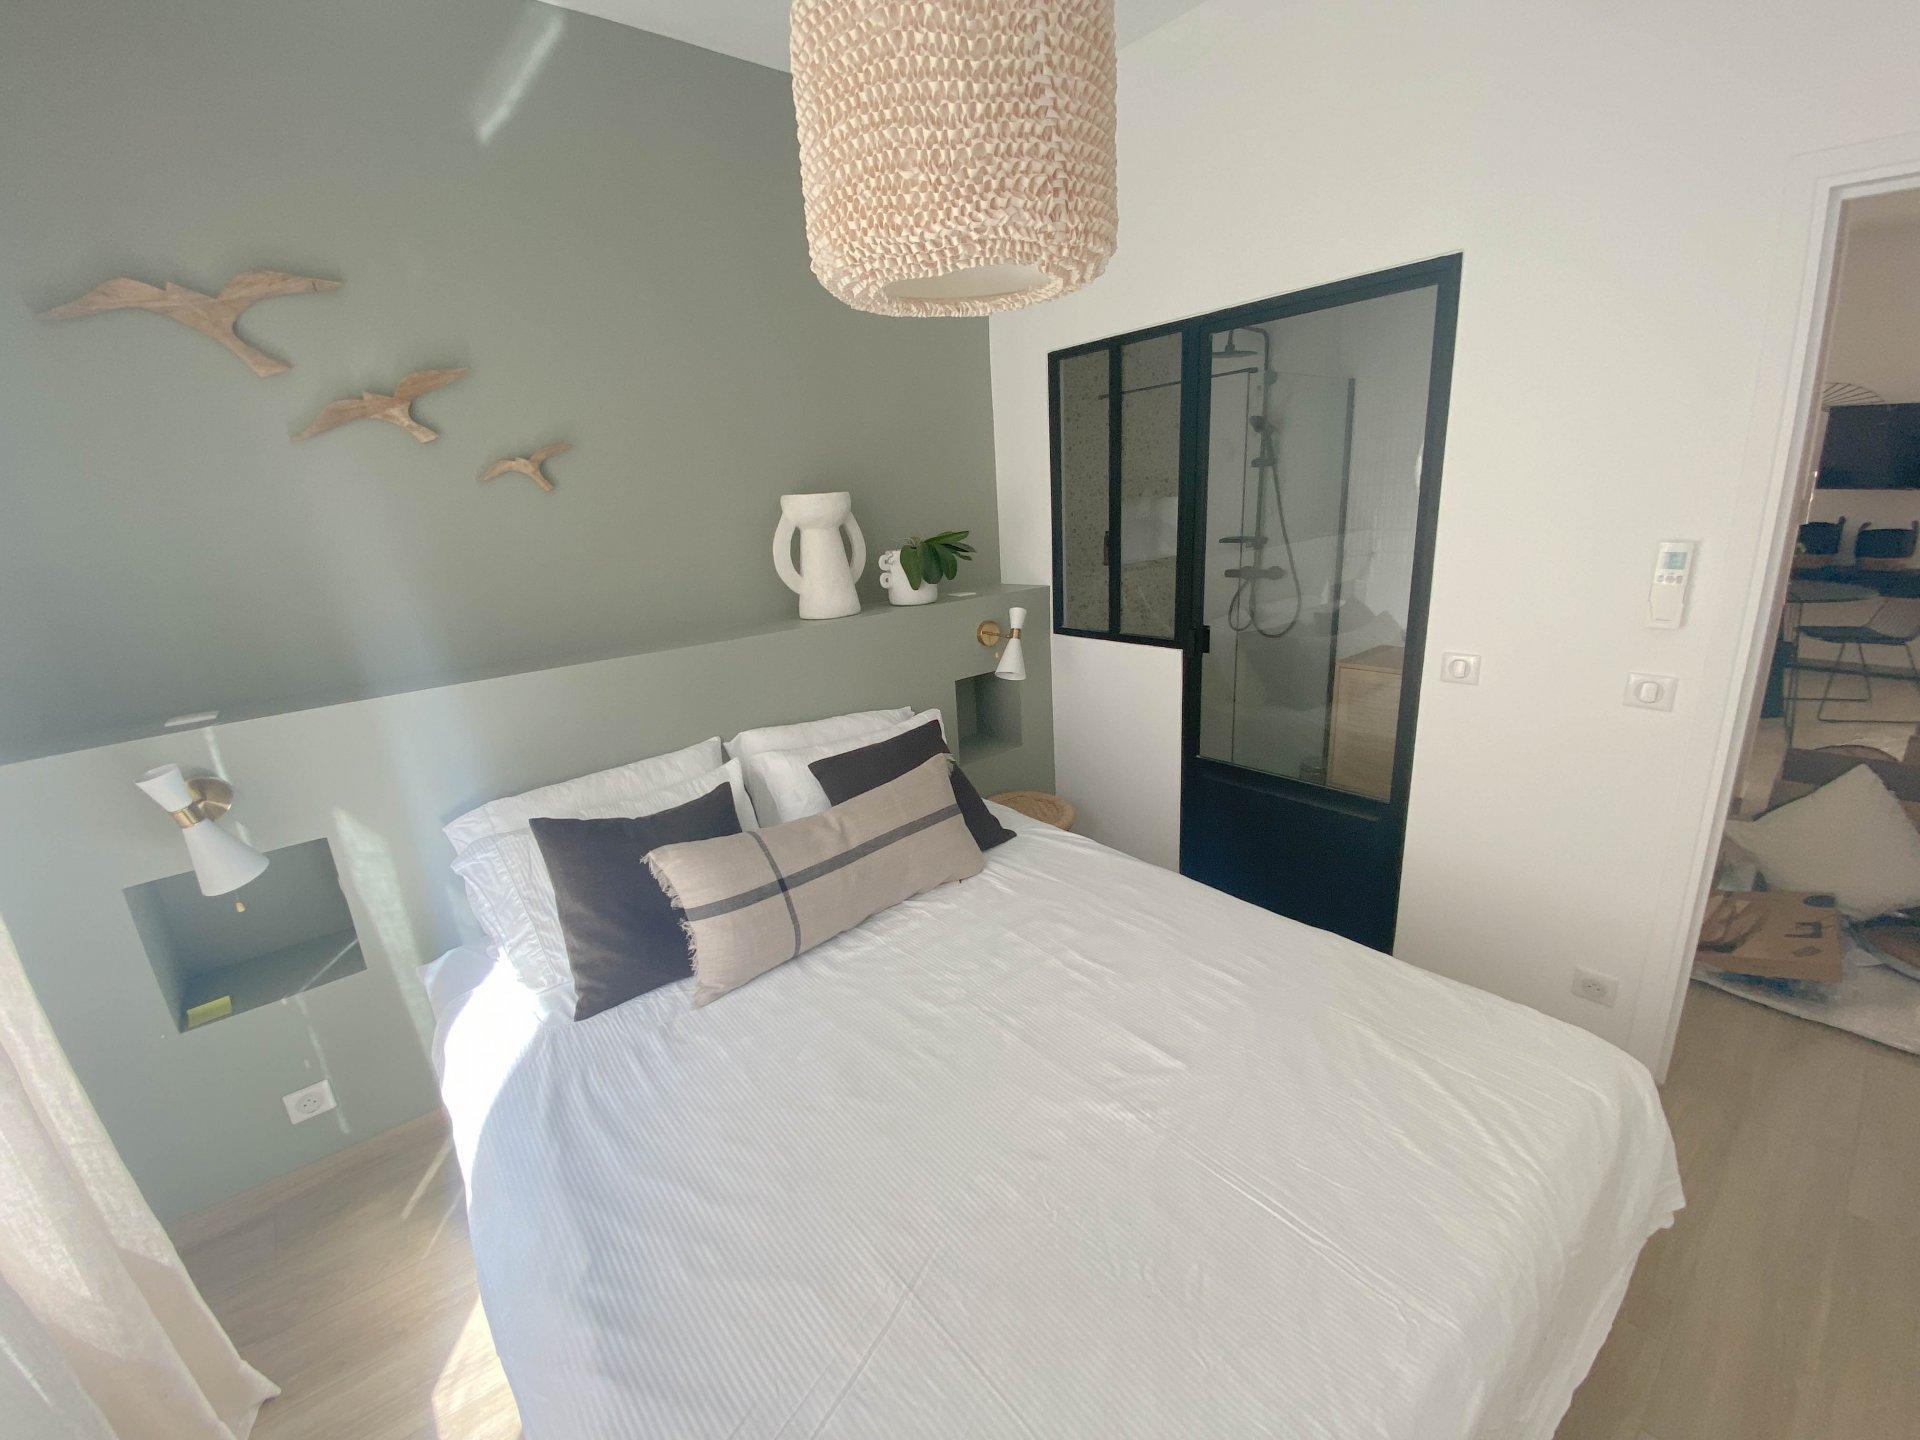 Huur Appartement - Nice Saint-Barthélémy